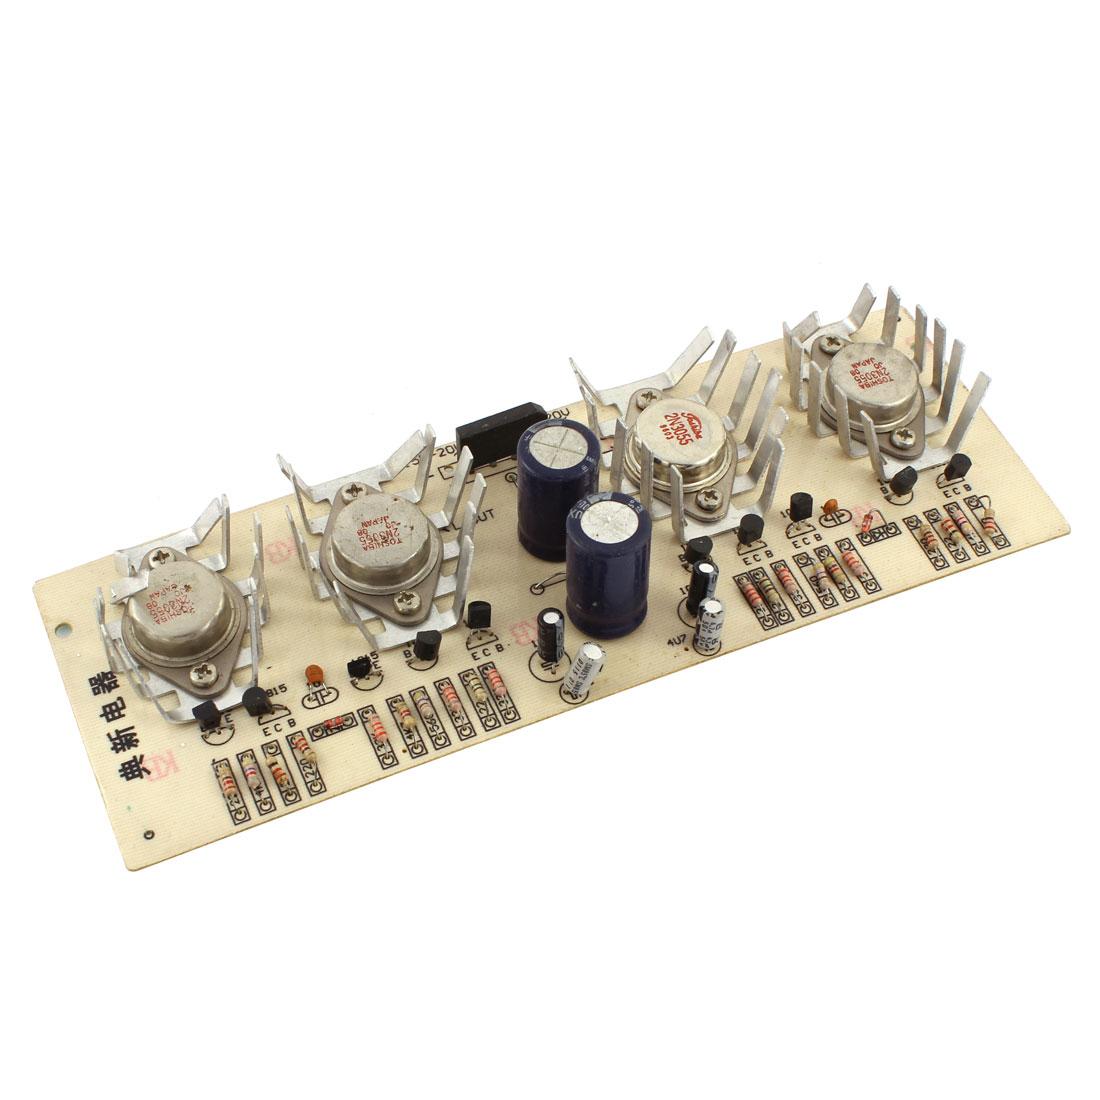 TV Satellite Power Supply PCB Board for DVD DVB Player